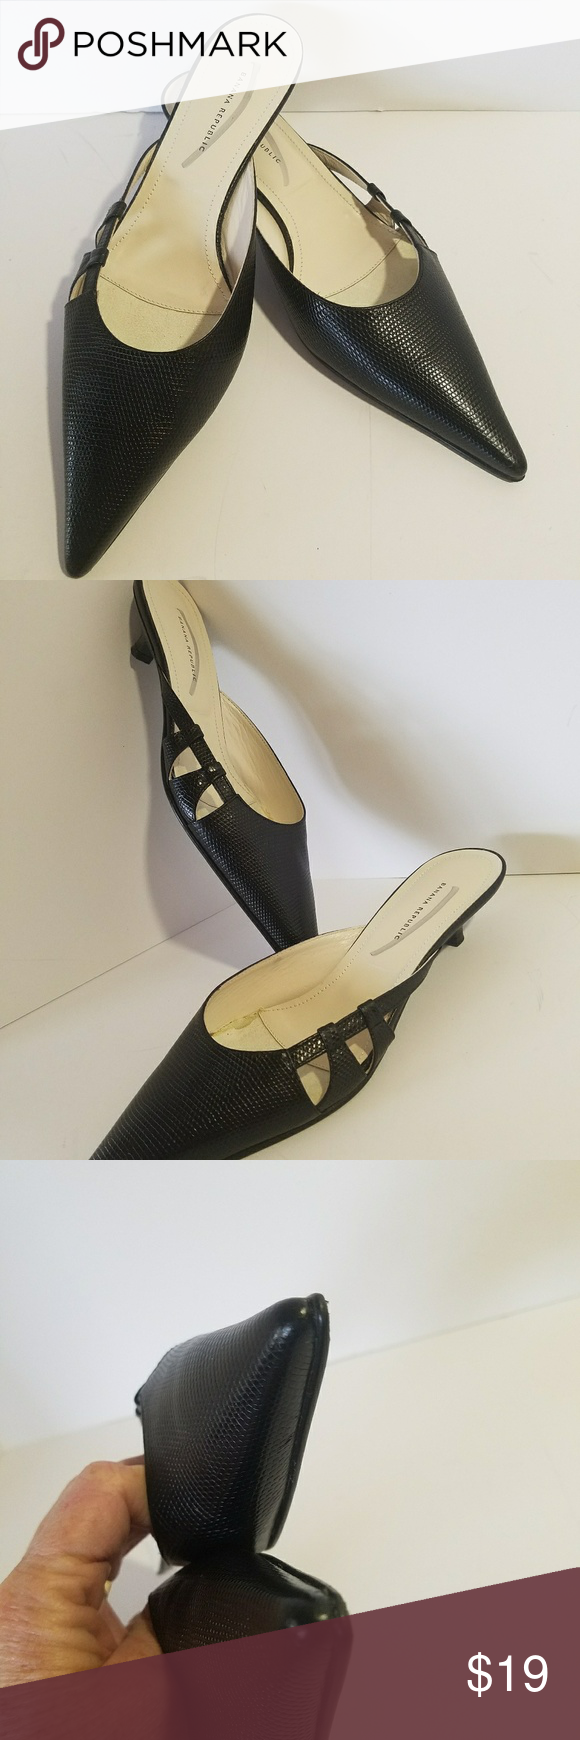 "Kitten Slides Heels Banana Republic Black Size 6.5 Banana Republic - Kitten Heels - Slides - 1"" Heels - Pointy Toed - Black - Size 6.5 - PreOwned - VGC Item#01-09S Banana Republic Shoes Heels"